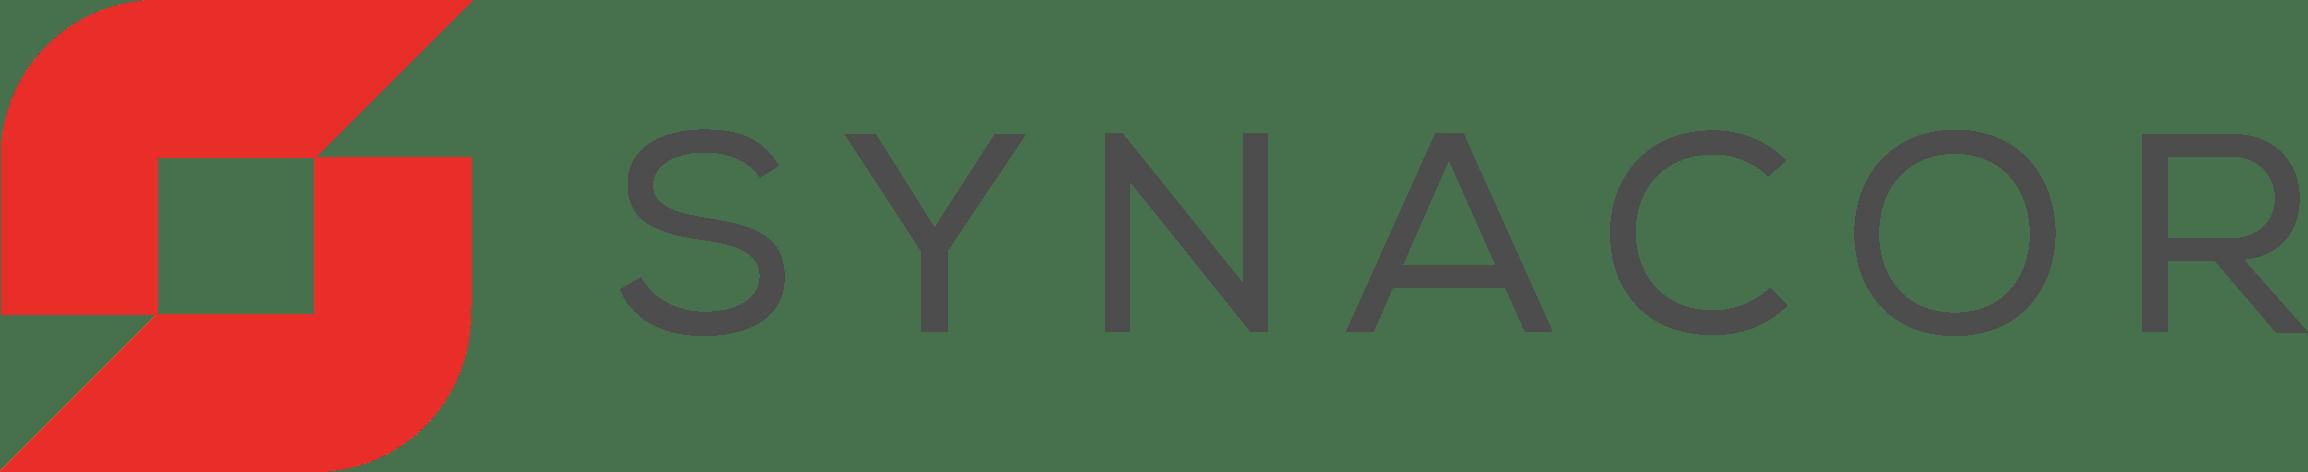 Synacor Logo Cropped Transparent Background